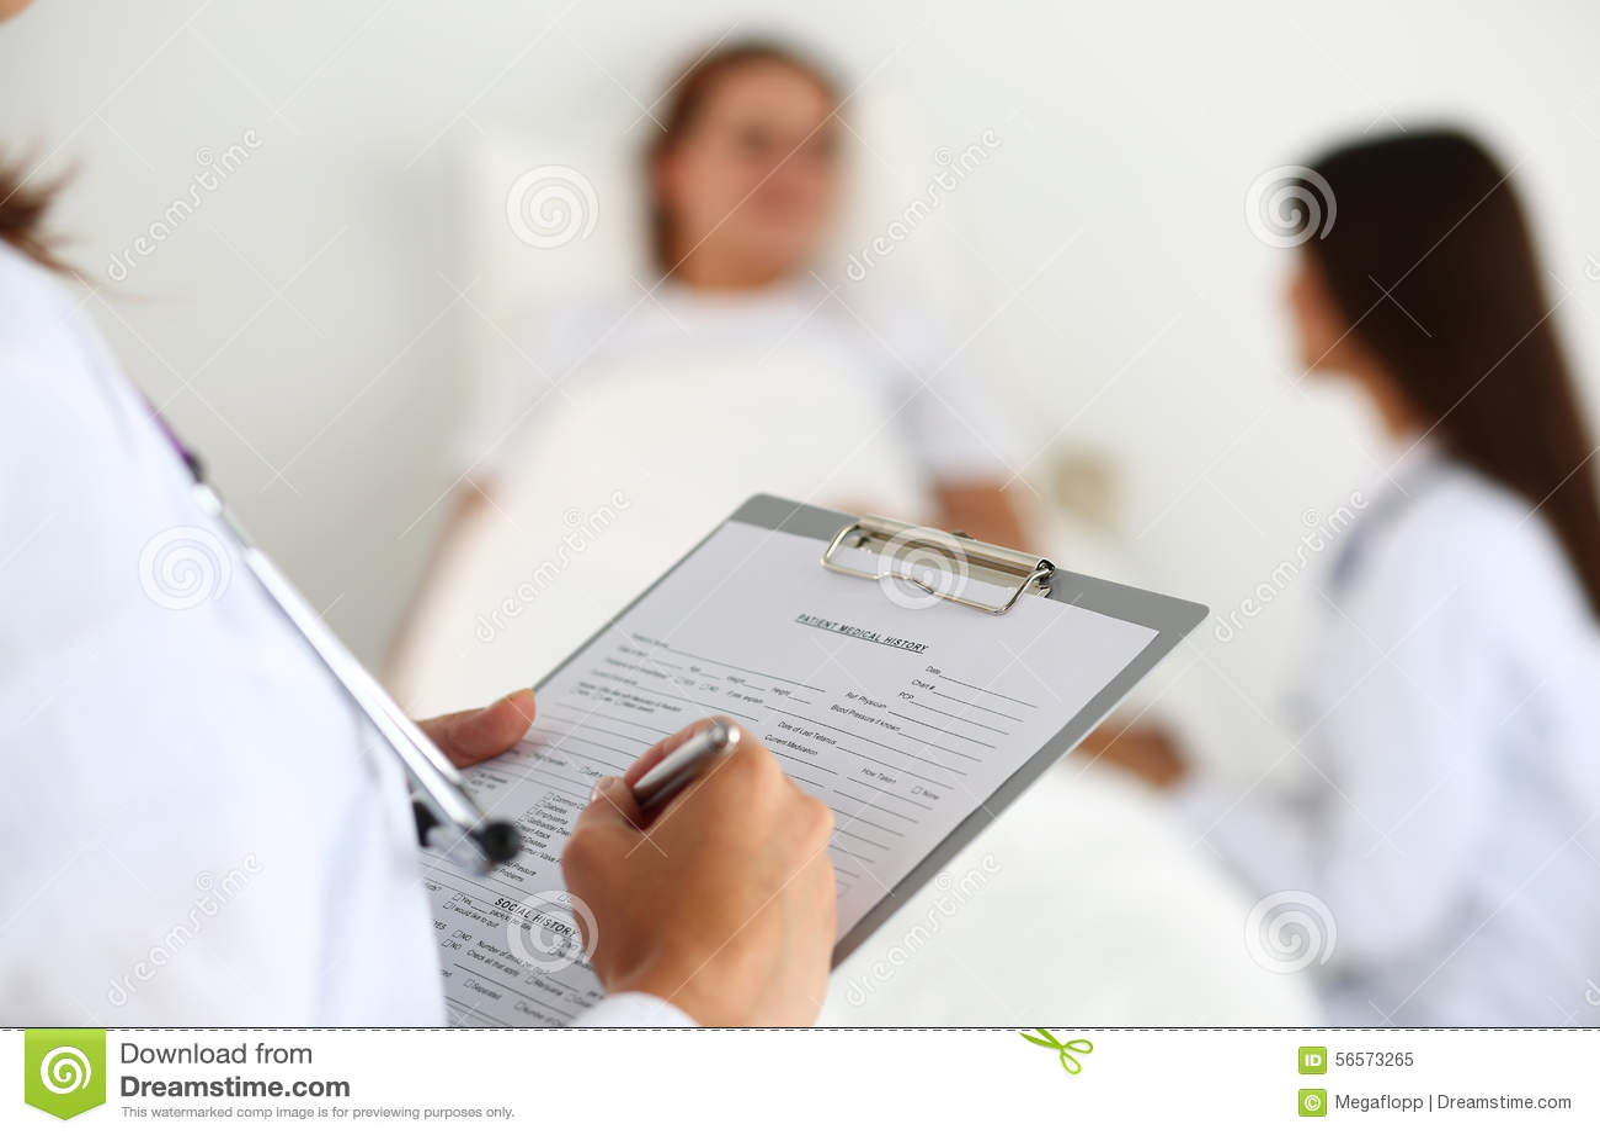 Download Όμορφος θηλυκός γιατρός ιατρικής που φαίνεται κεκλεισμένων των θυρών Στοκ Εικόνα - εικόνα από εγγράφων, έννοια: 56573265